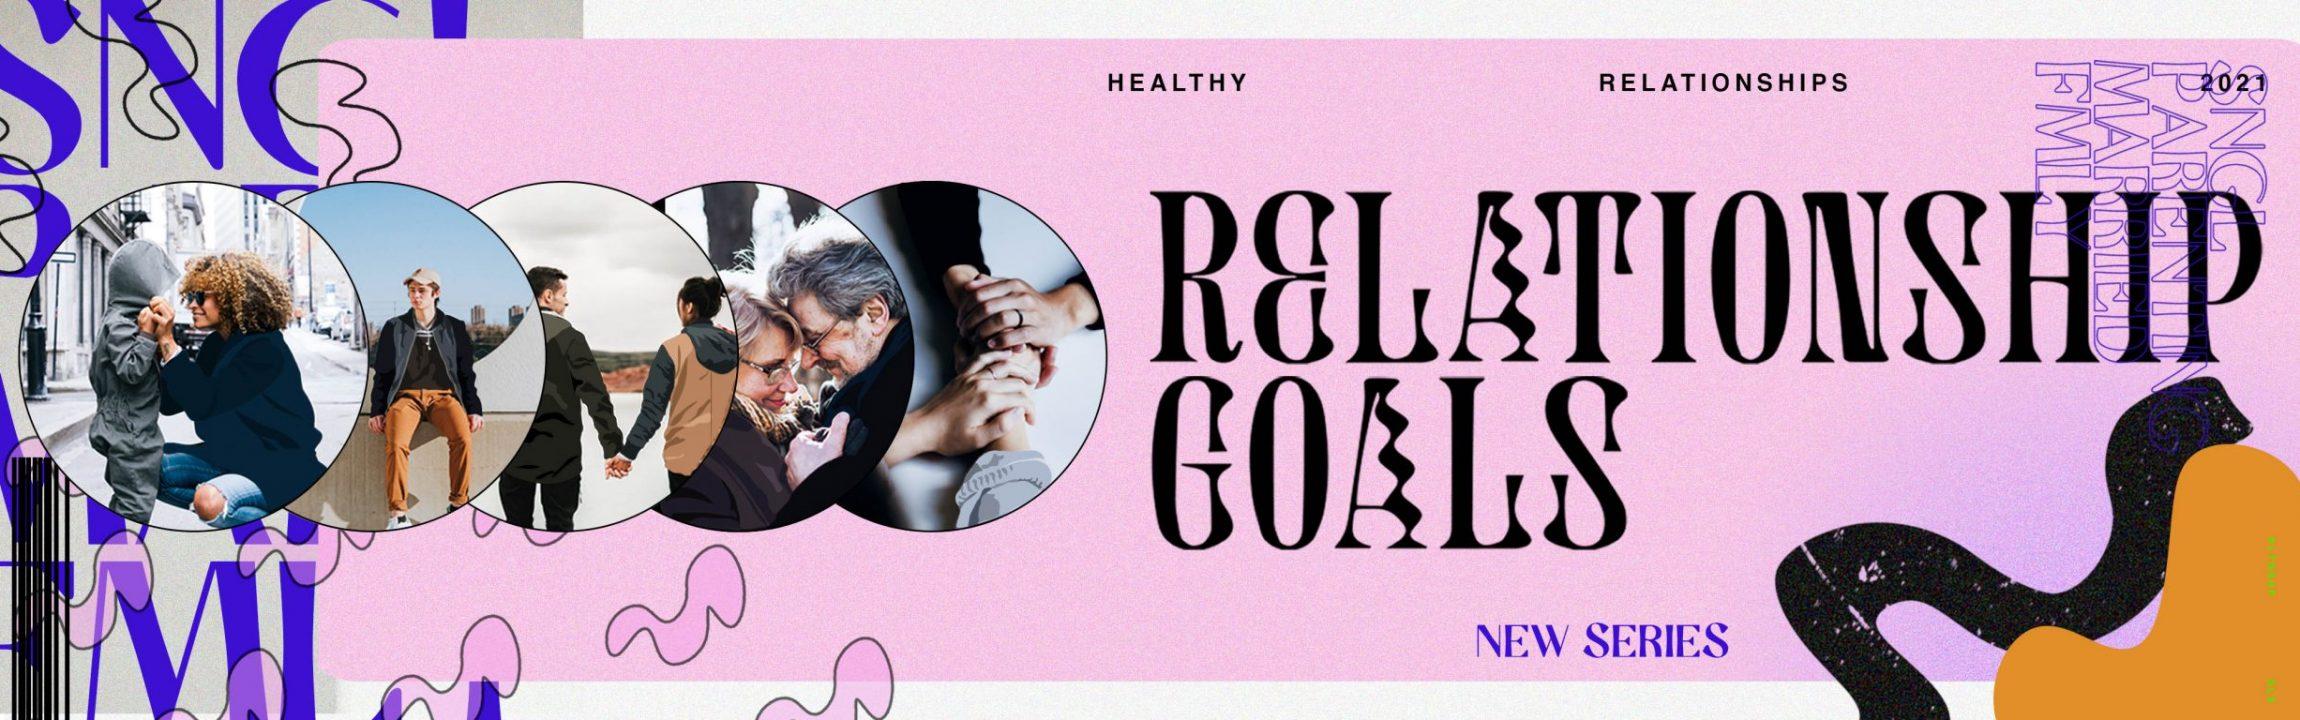 relationship goals website feature compressed